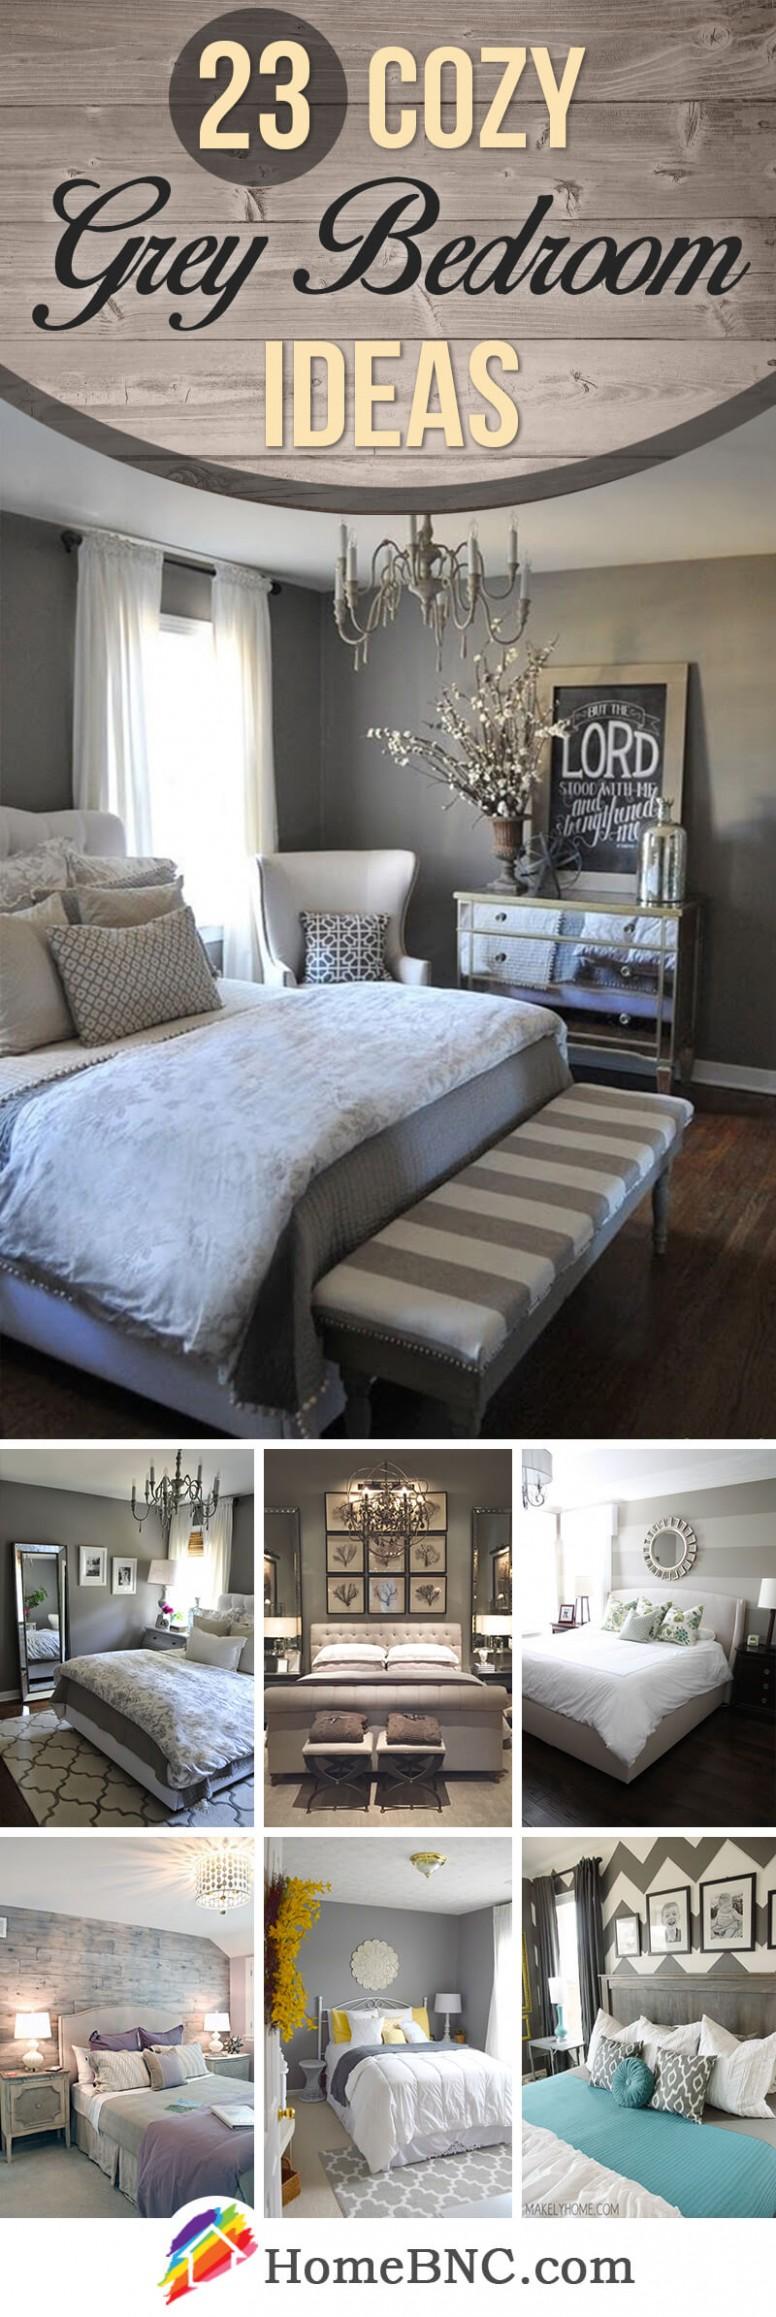 9 Best Grey Bedroom Ideas and Designs for 9 - Bedroom Ideas Uk 2020